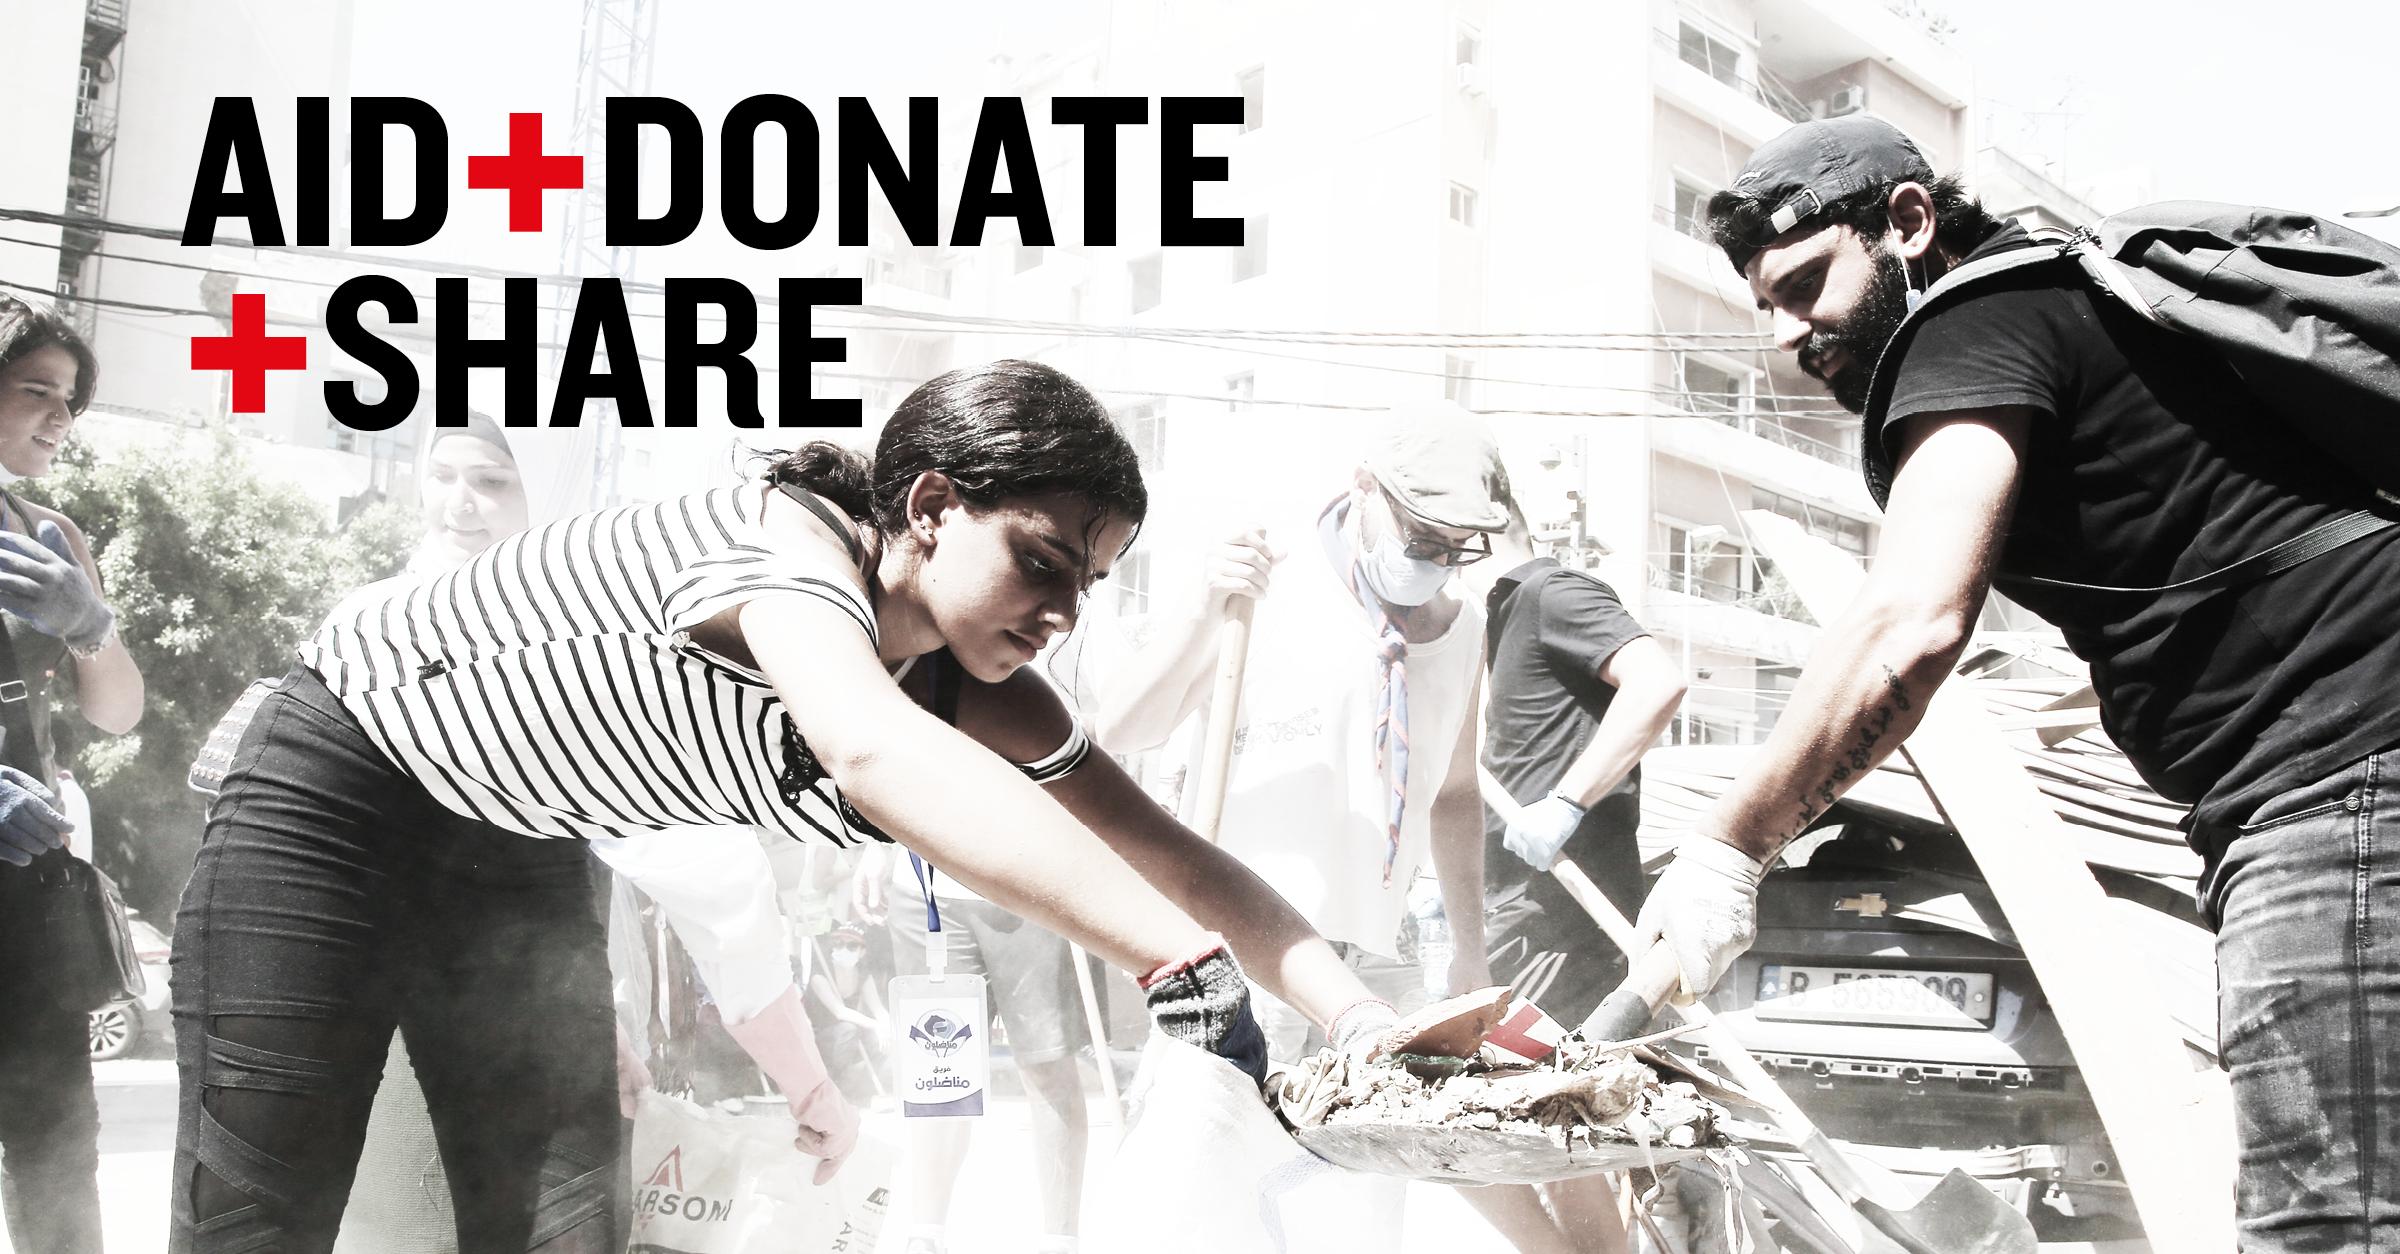 Beirut_Aid+Donate+Share_LinkedIn-1